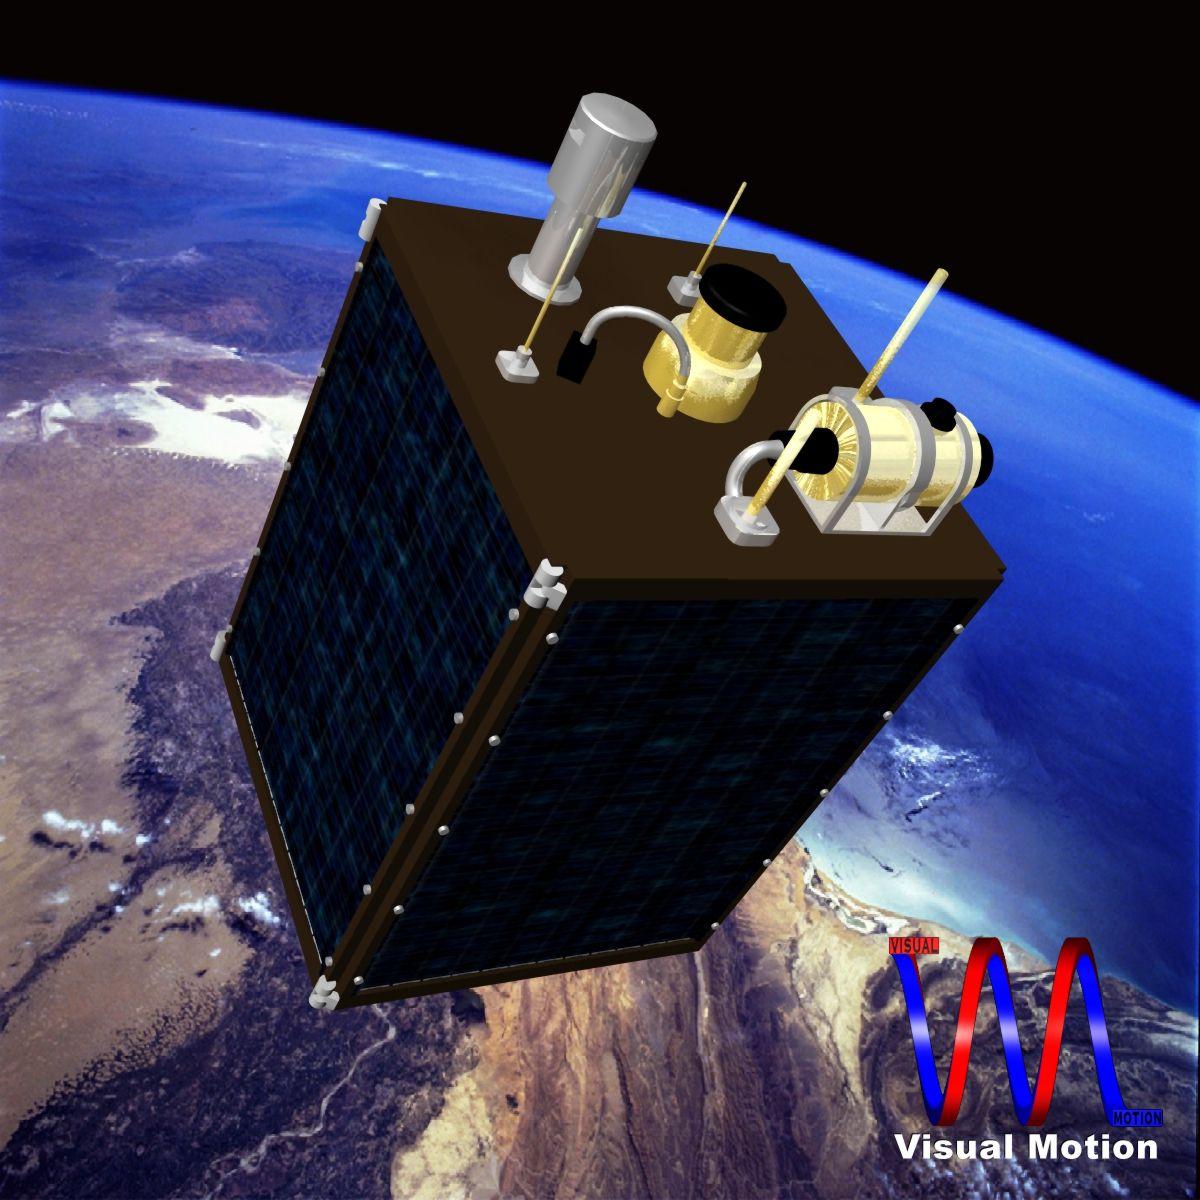 dprk kwangmyongsong-3 satellite 3d modelo 3ds dxf cob x obj 134453